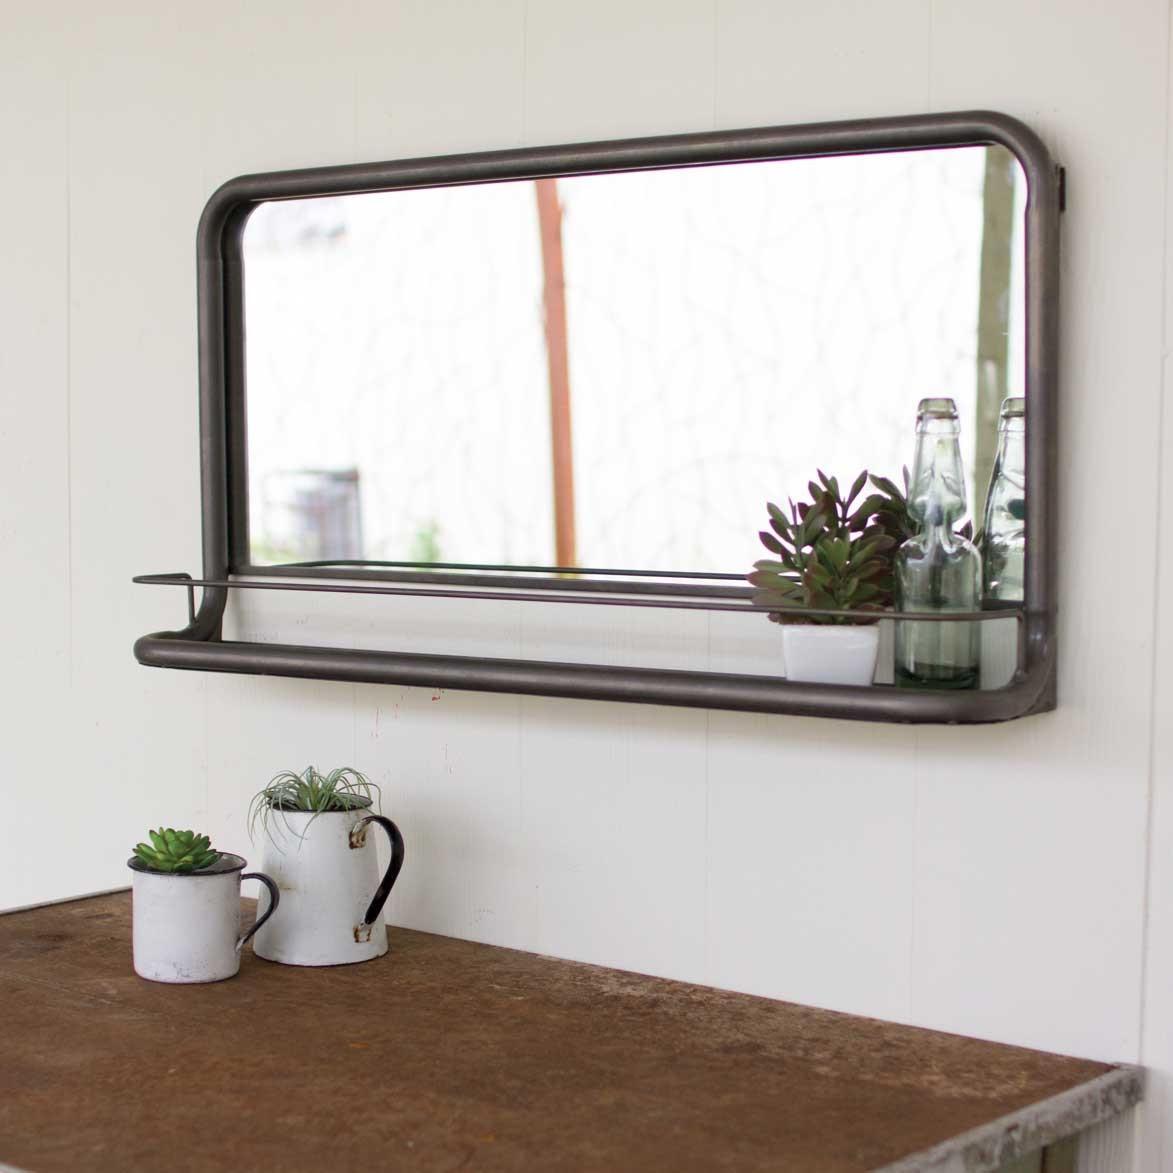 Metal Framed Mirrors Bathroom  Rustic Metal Frame Horizontal Pharmacy Mirror with Shelf